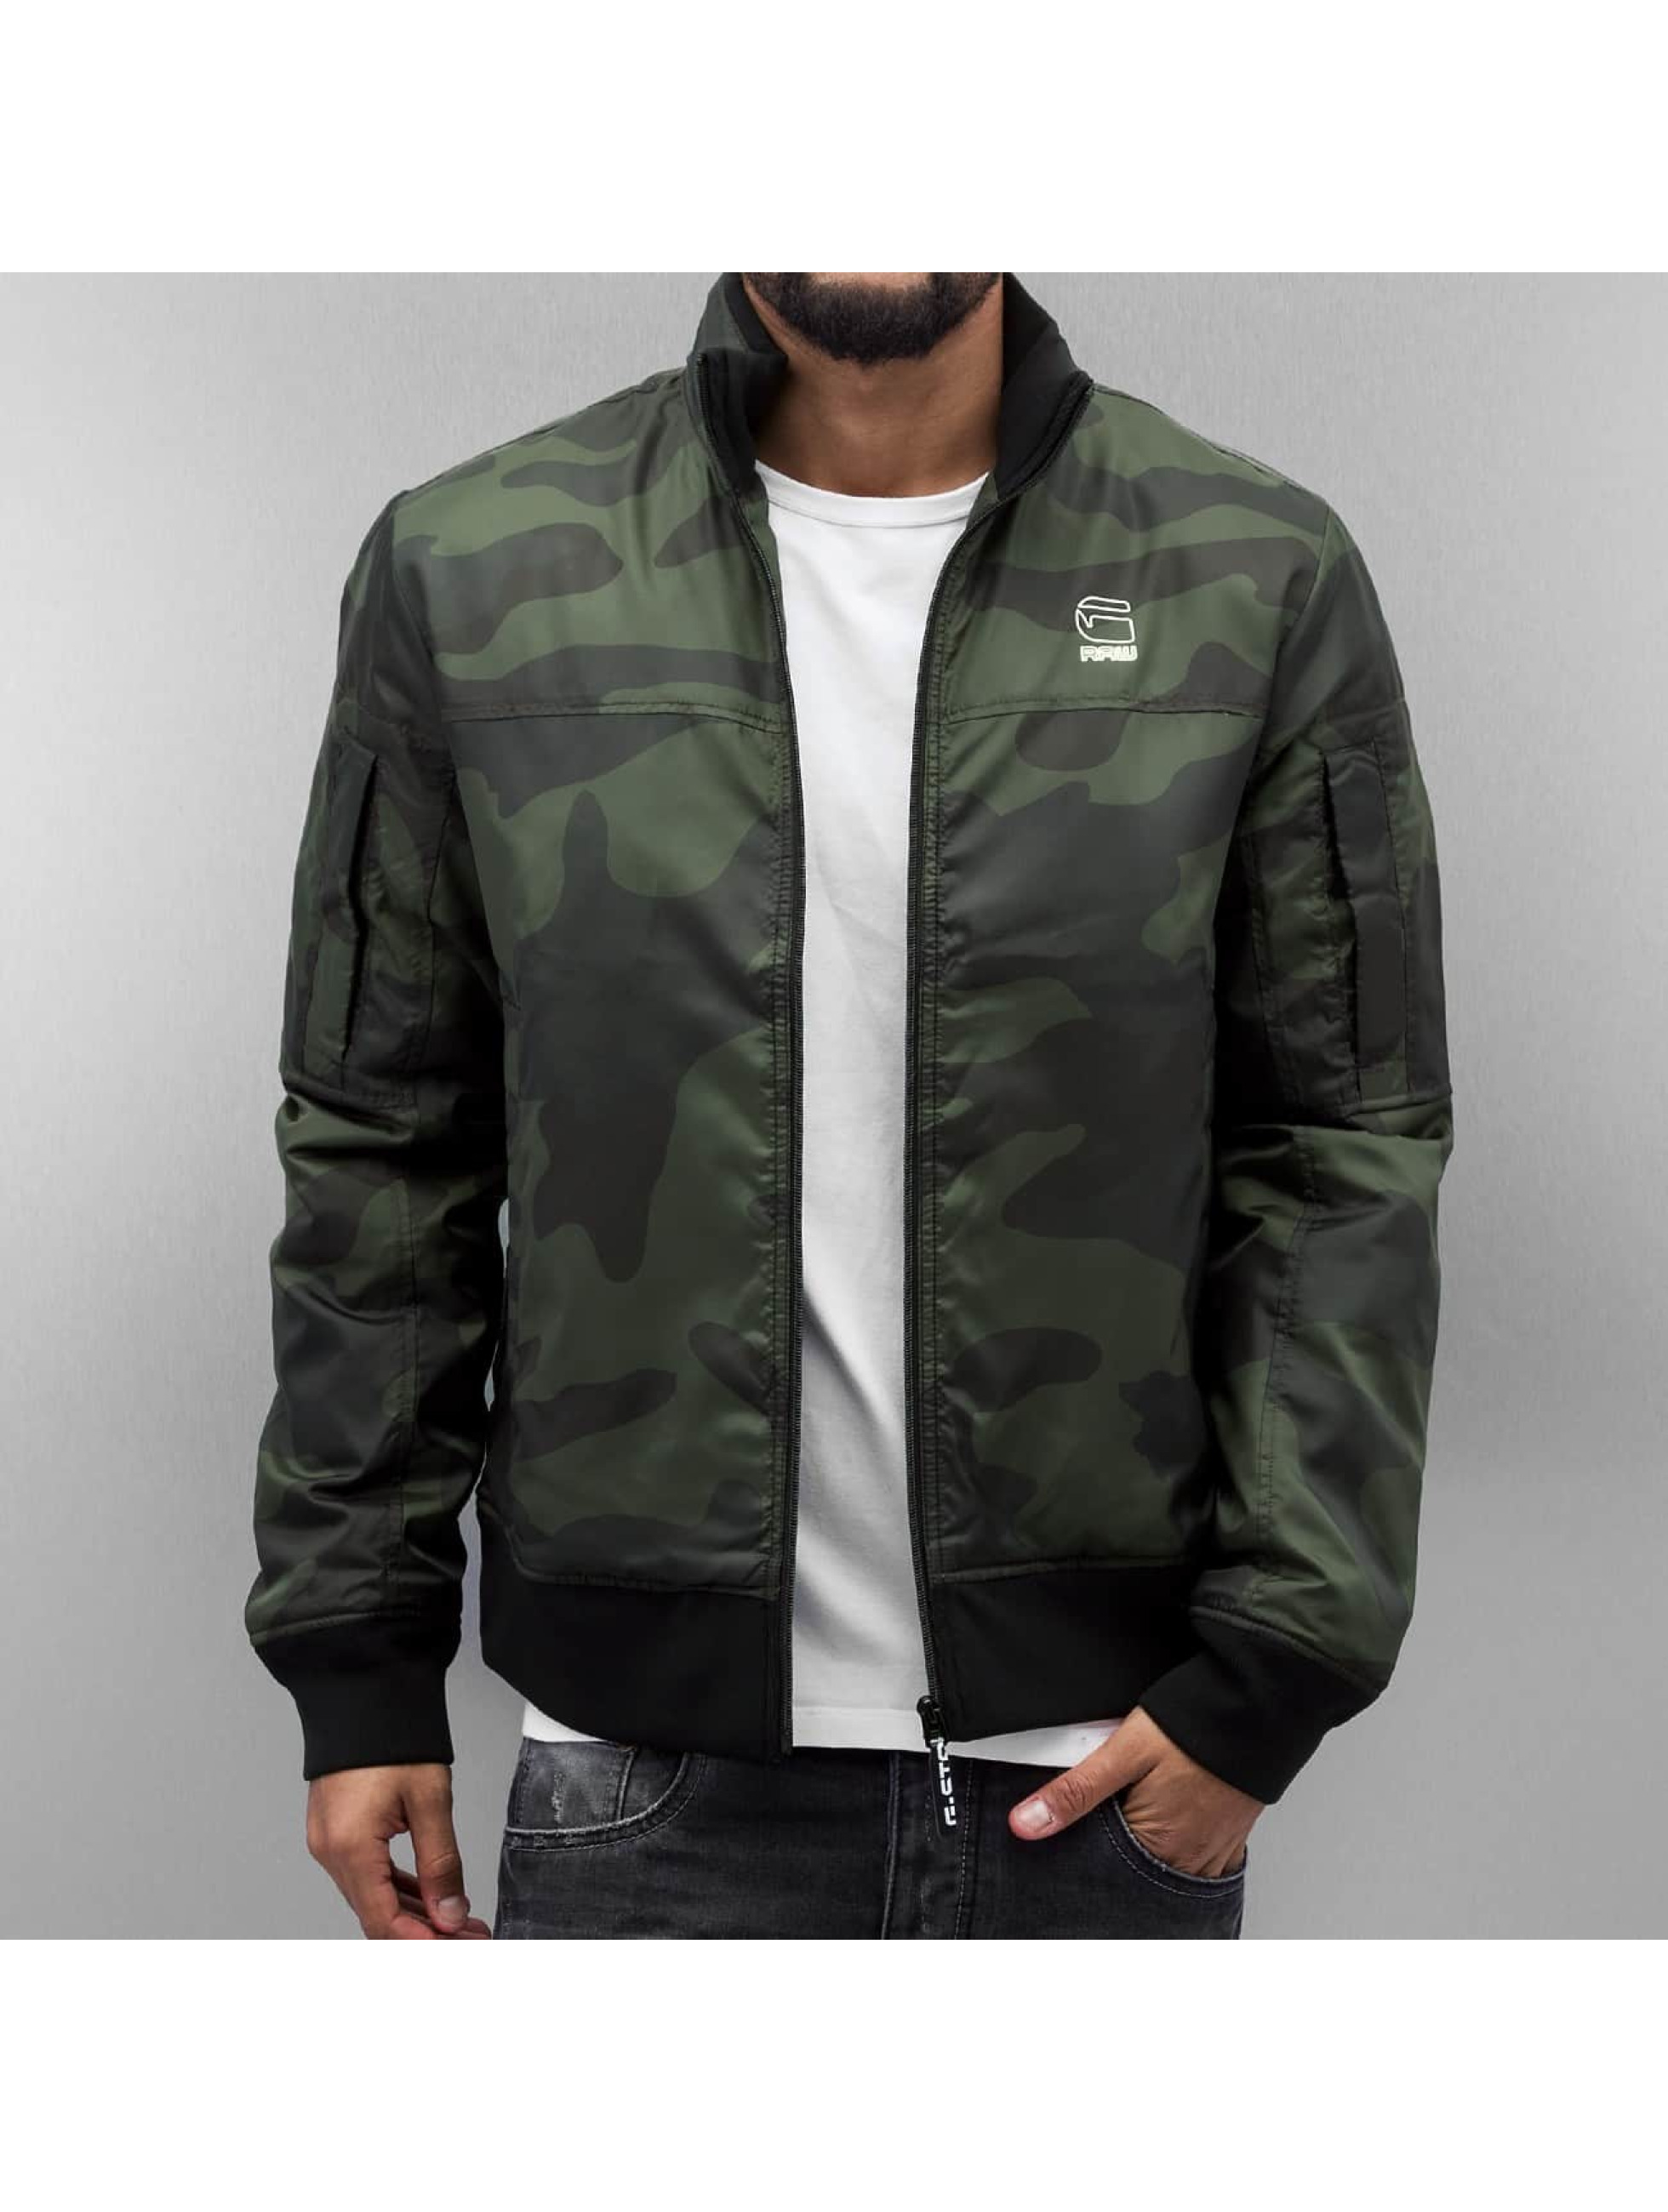 Übergangsjacke Nancor Overshirt in camouflage